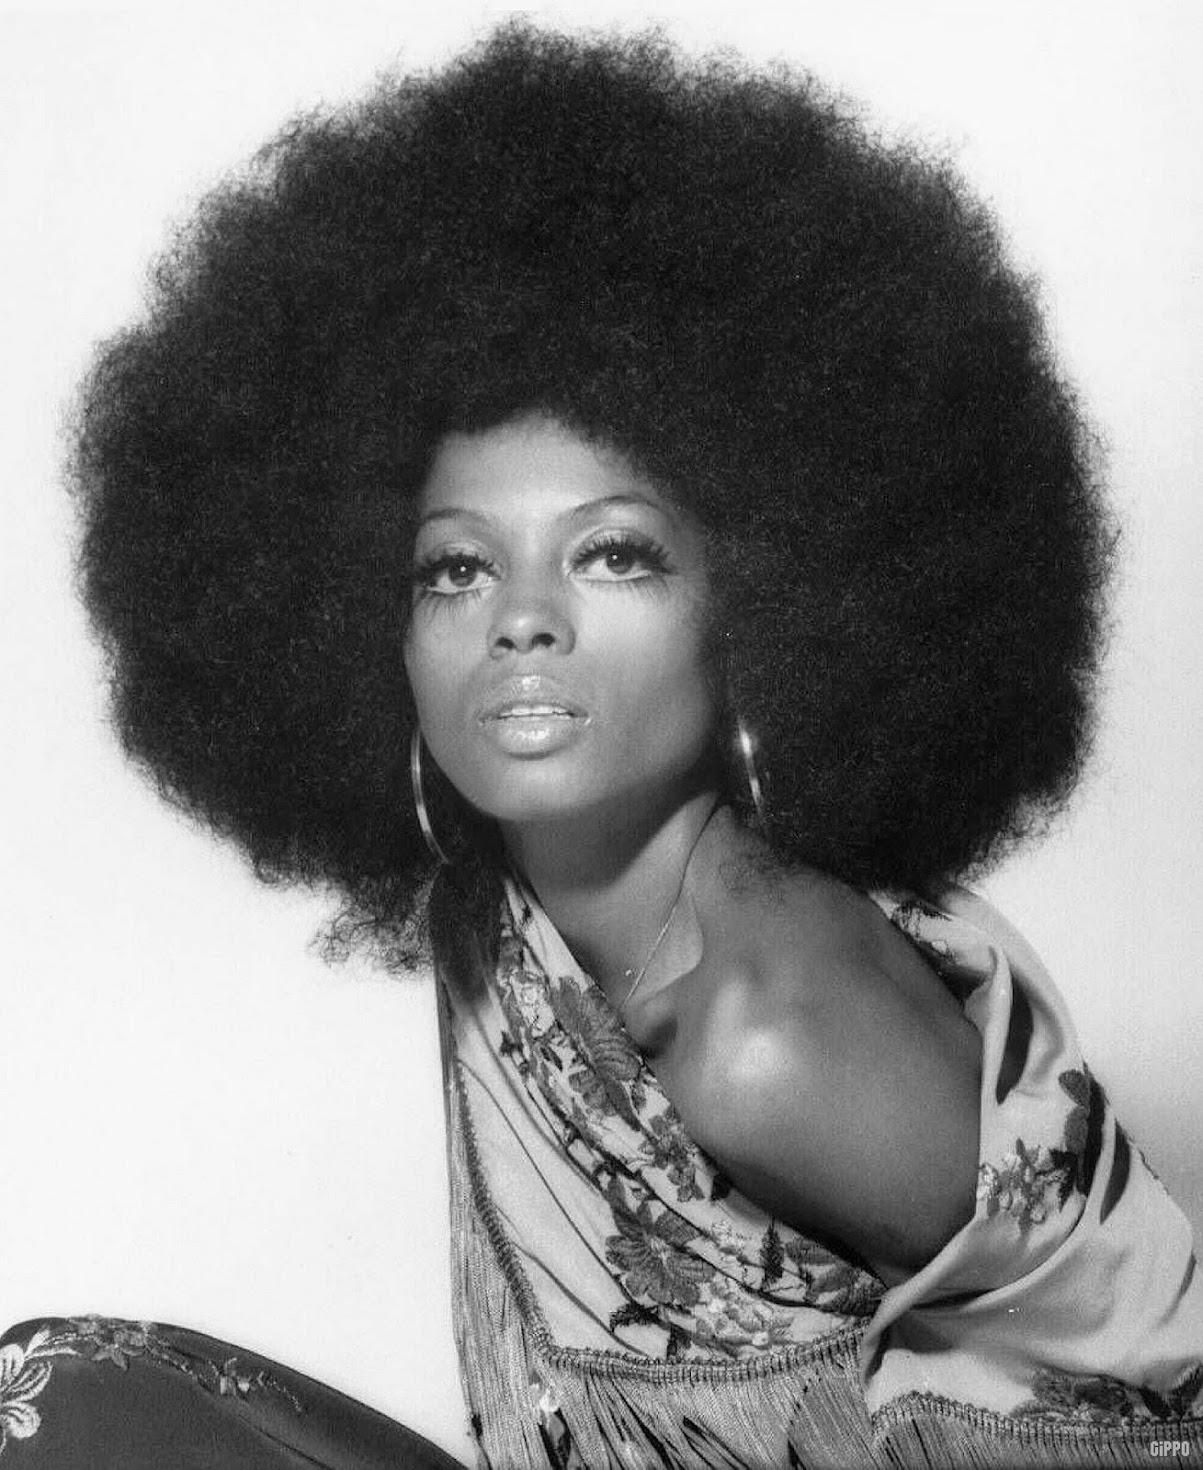 http://2.bp.blogspot.com/-InkKNxc3dbs/UT9qmBfrAgI/AAAAAAAATgM/-ZLExKJpbaM/s1470/Beautiful+Curly+Hair+02.jpg